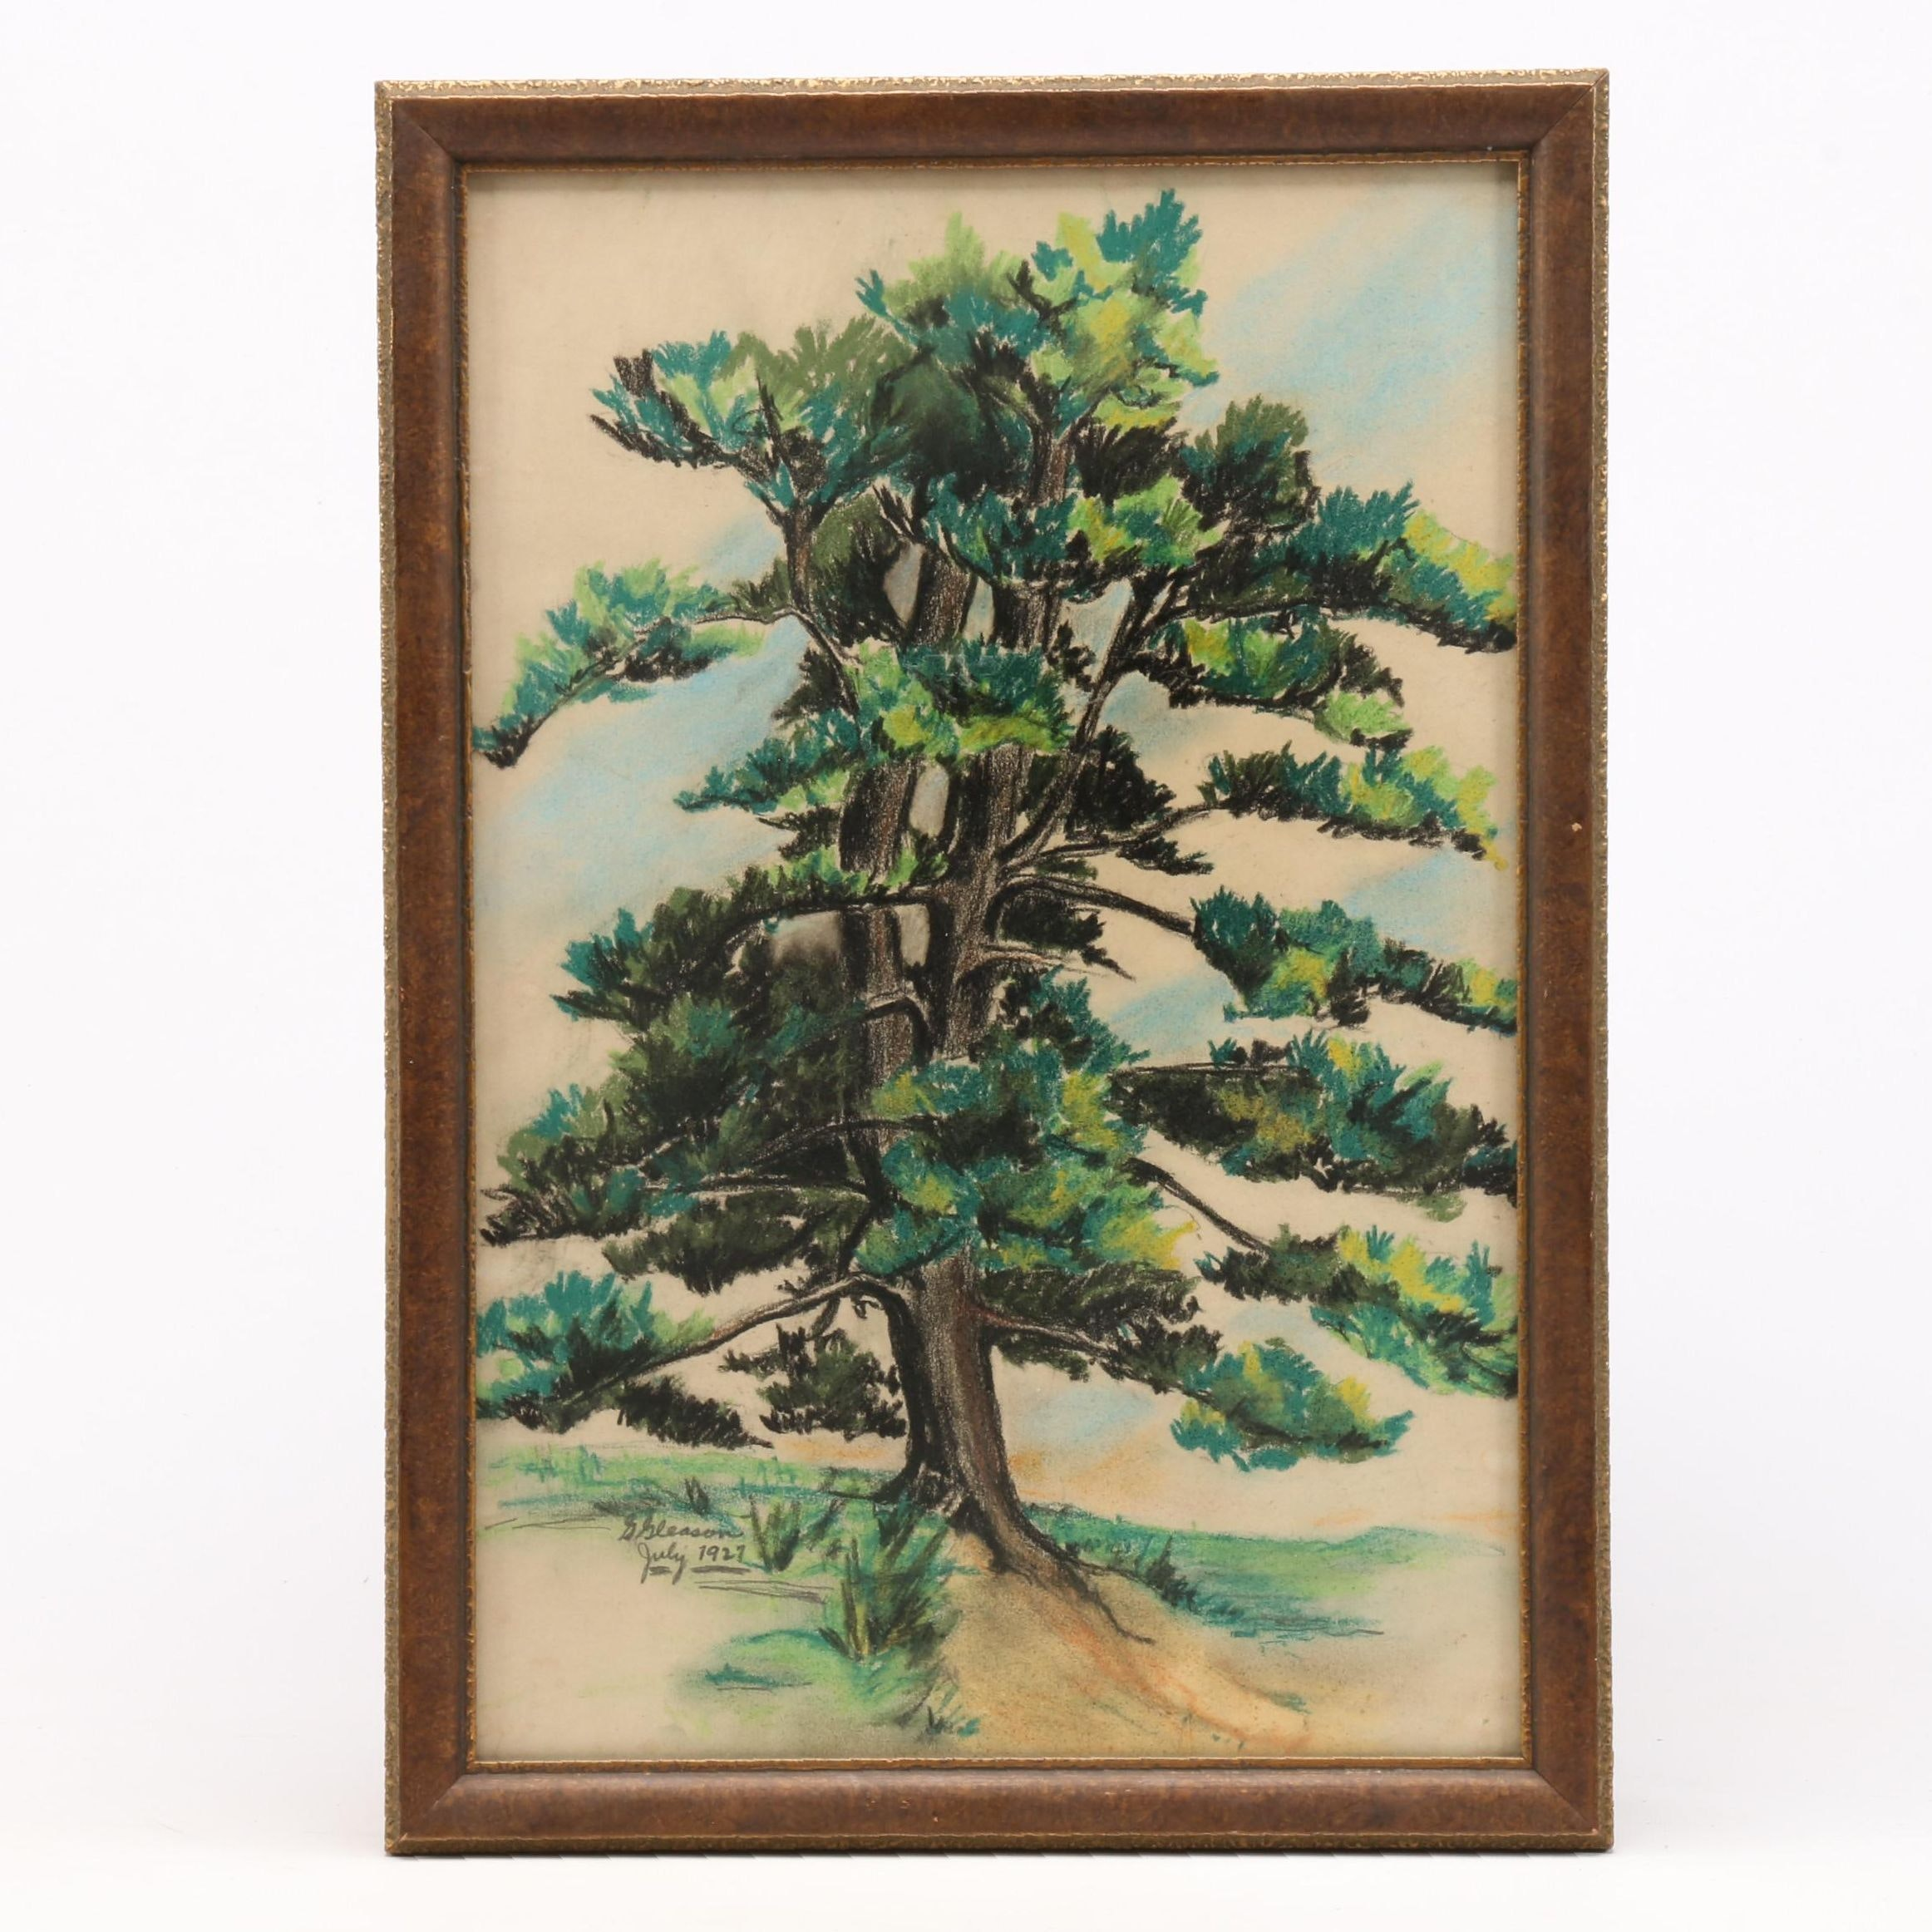 G. Gleason 1927 Pastel Drawing of Tree